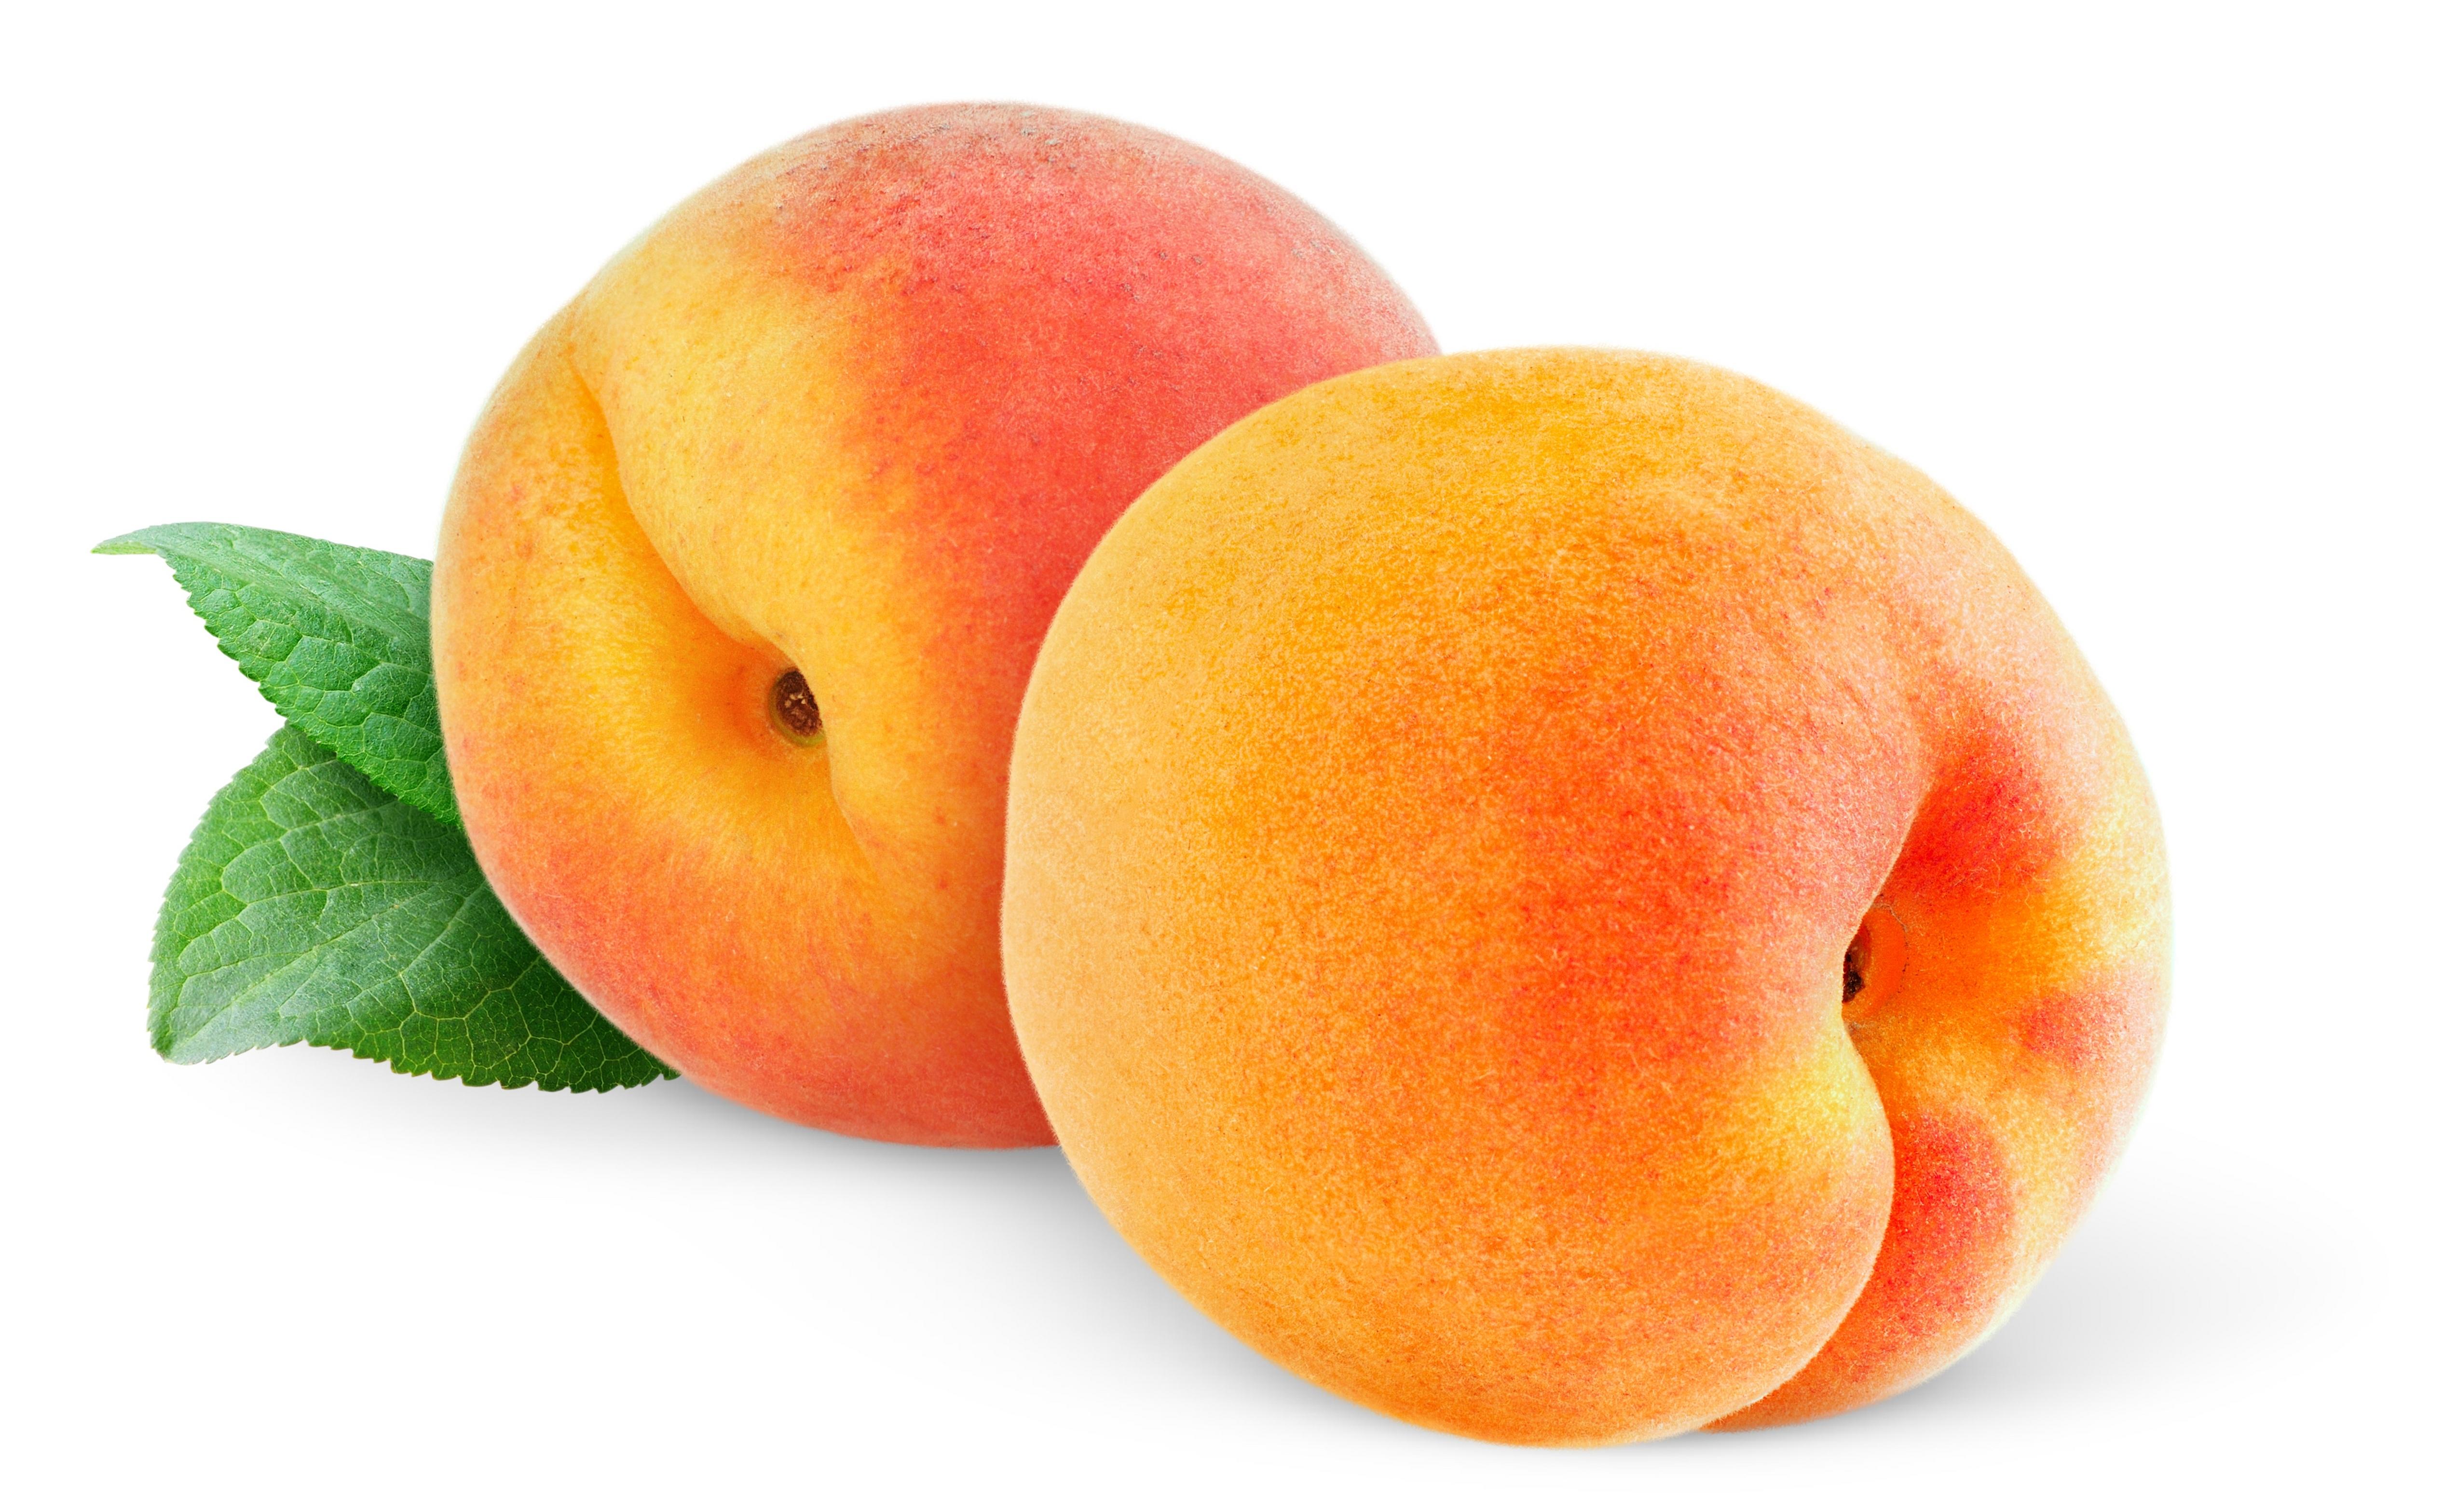 Peaches peaches vegetables fruit white background wallpaper 5065x3135